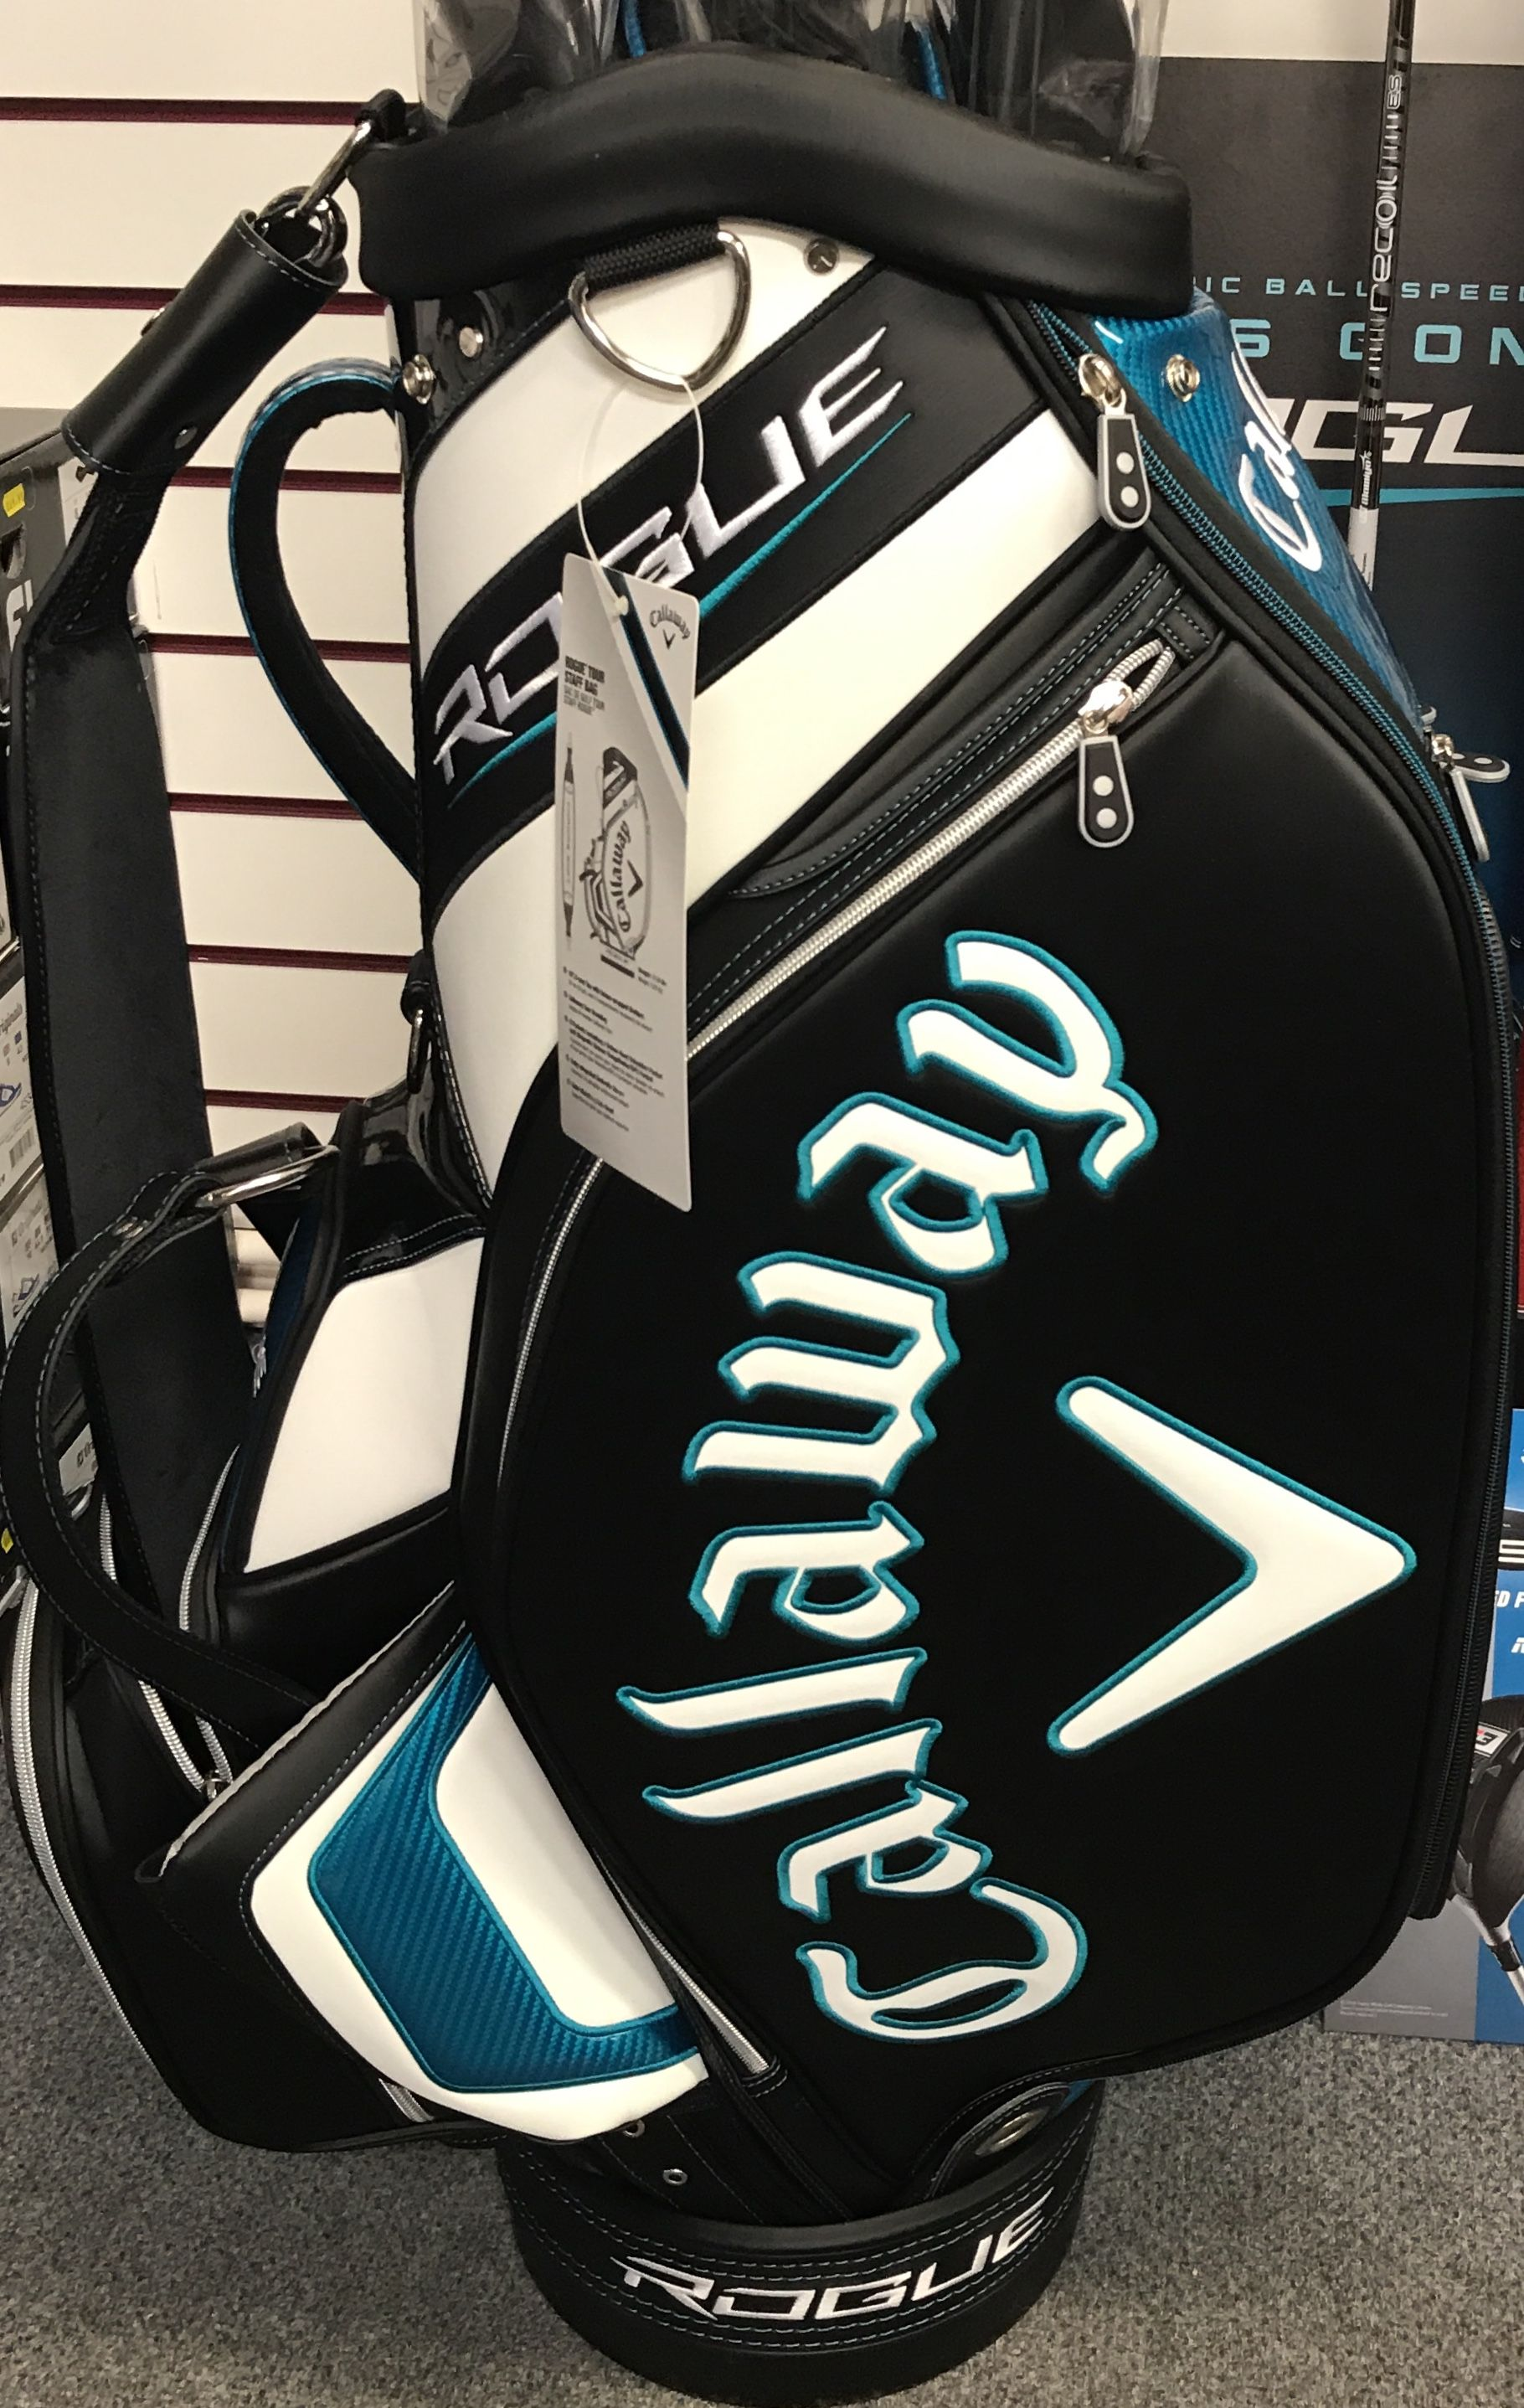 11bc4d9d79b Callaway Rogue Tour Bag | golf | Bags, Louis vuitton twist, Shoulder bag